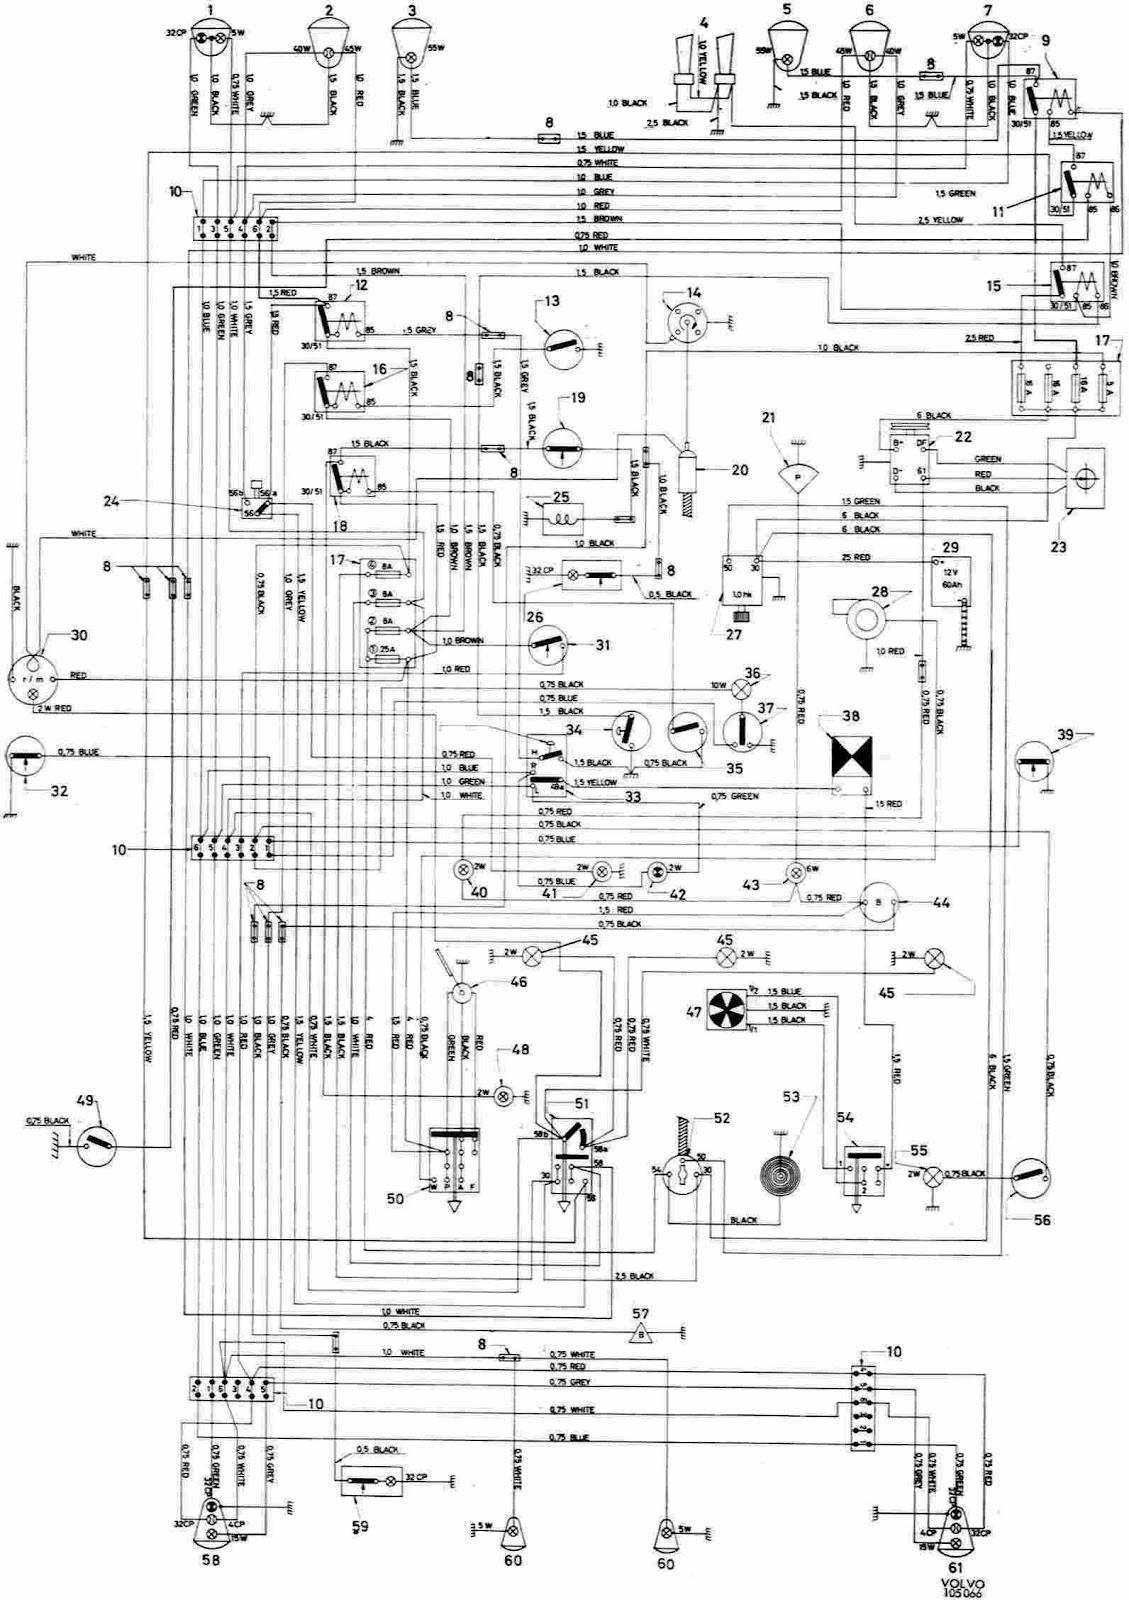 1980 f100 wiring diagram